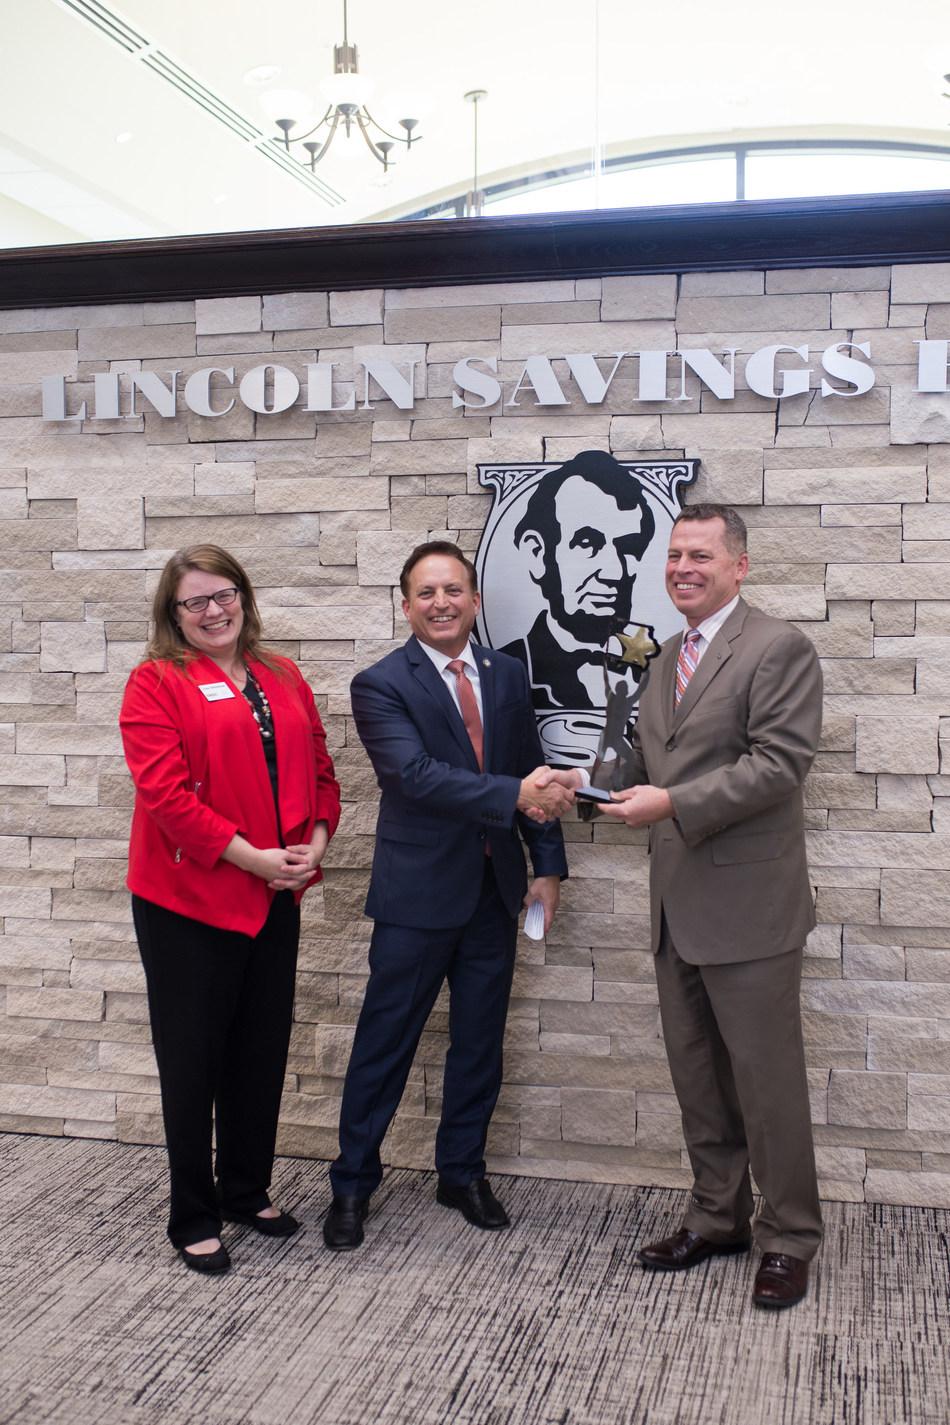 Iowa Secretary of State Paul Pate (center) and Lisa Shimkat, State Director of the Iowa SBDC (right) present SBDC Champion award to Erik Skovgard (left), LSB President and CEO